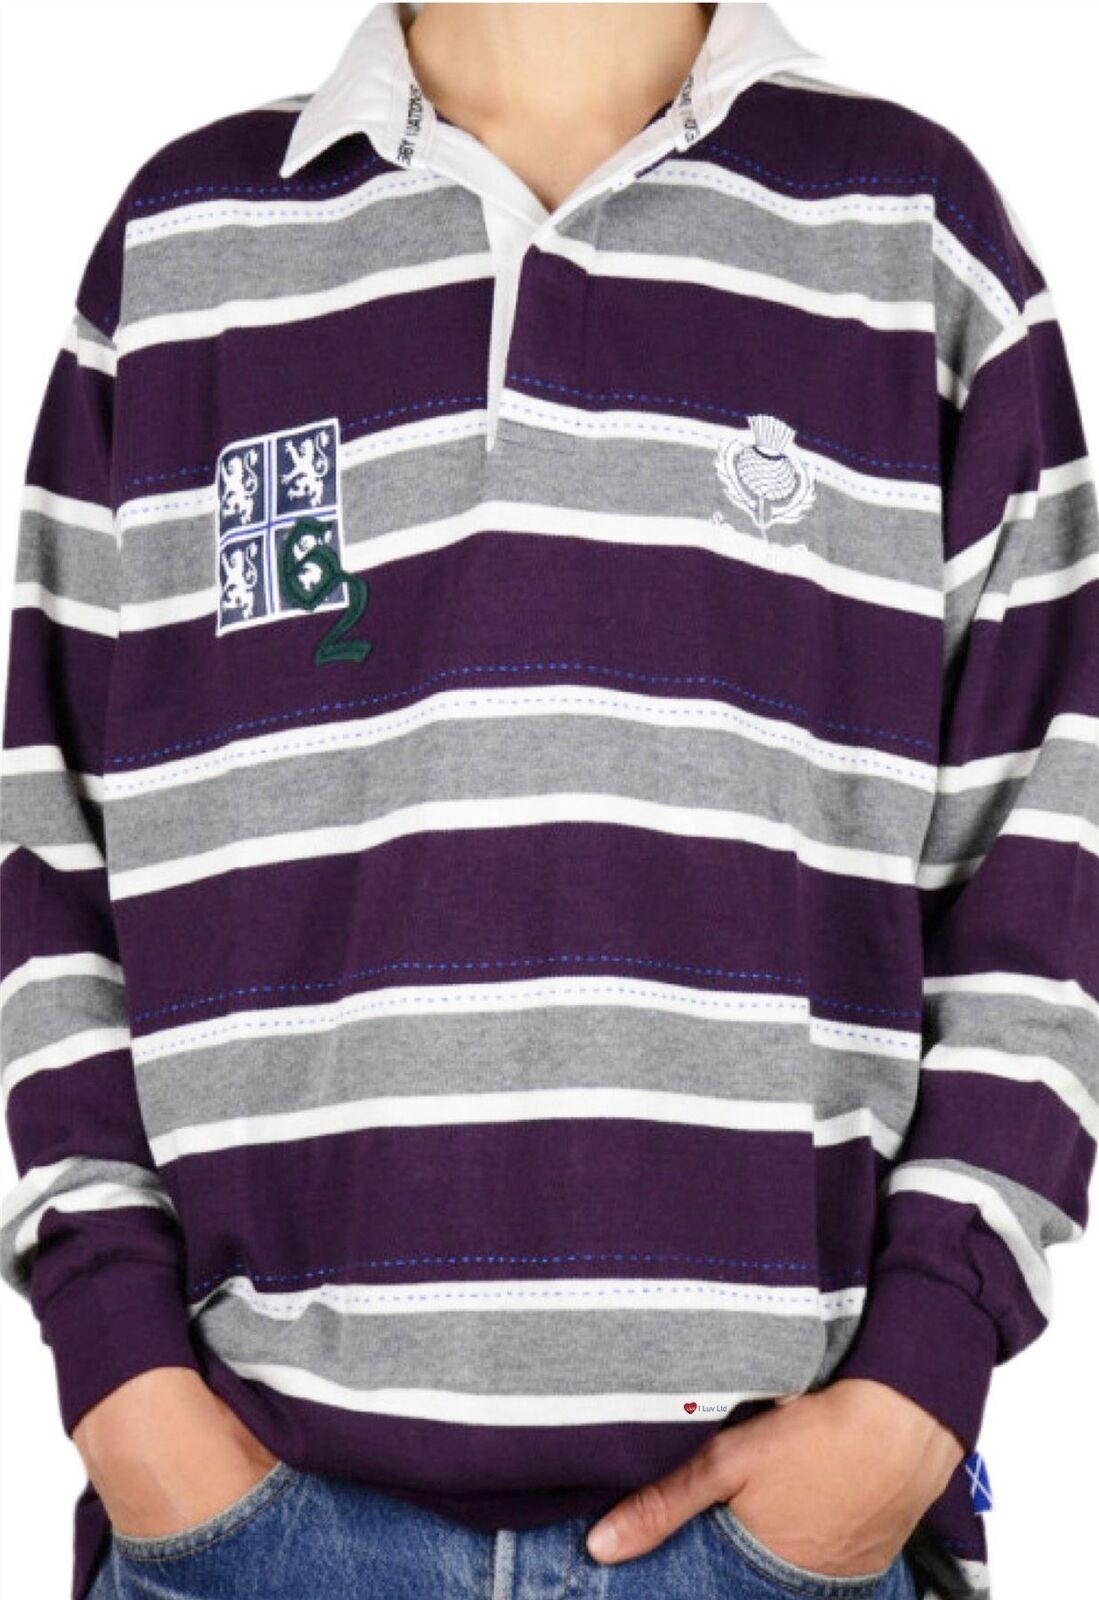 Scottish Rugby Shirt Men s Edinburgh 62 High Design Purple Grey Large